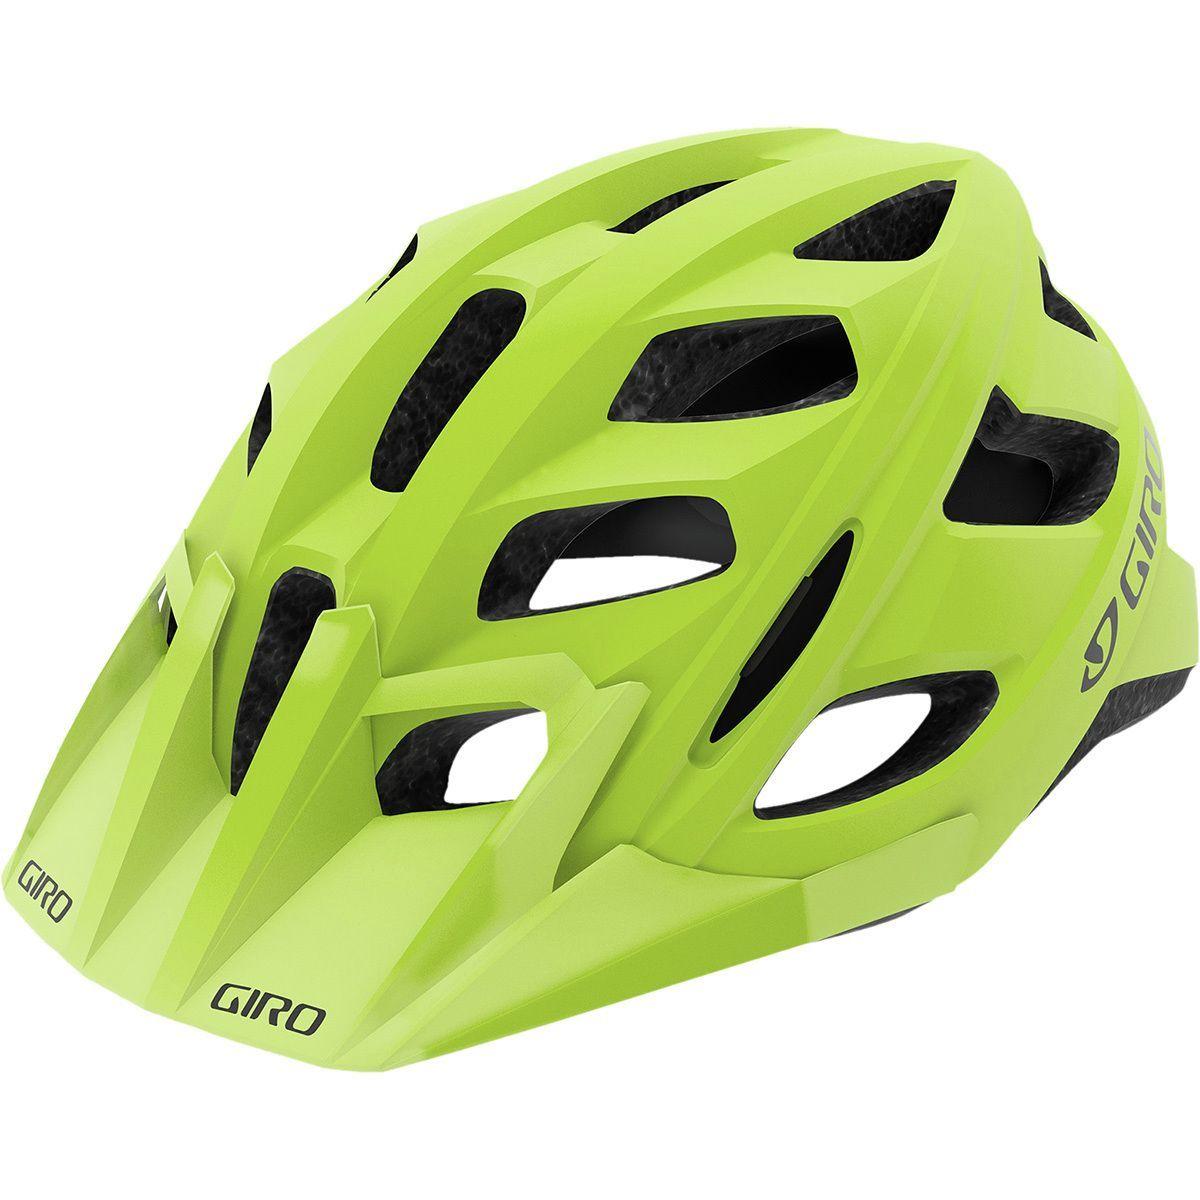 Giro Hex Helmet Helmet Giro Mountain Bike Helmets